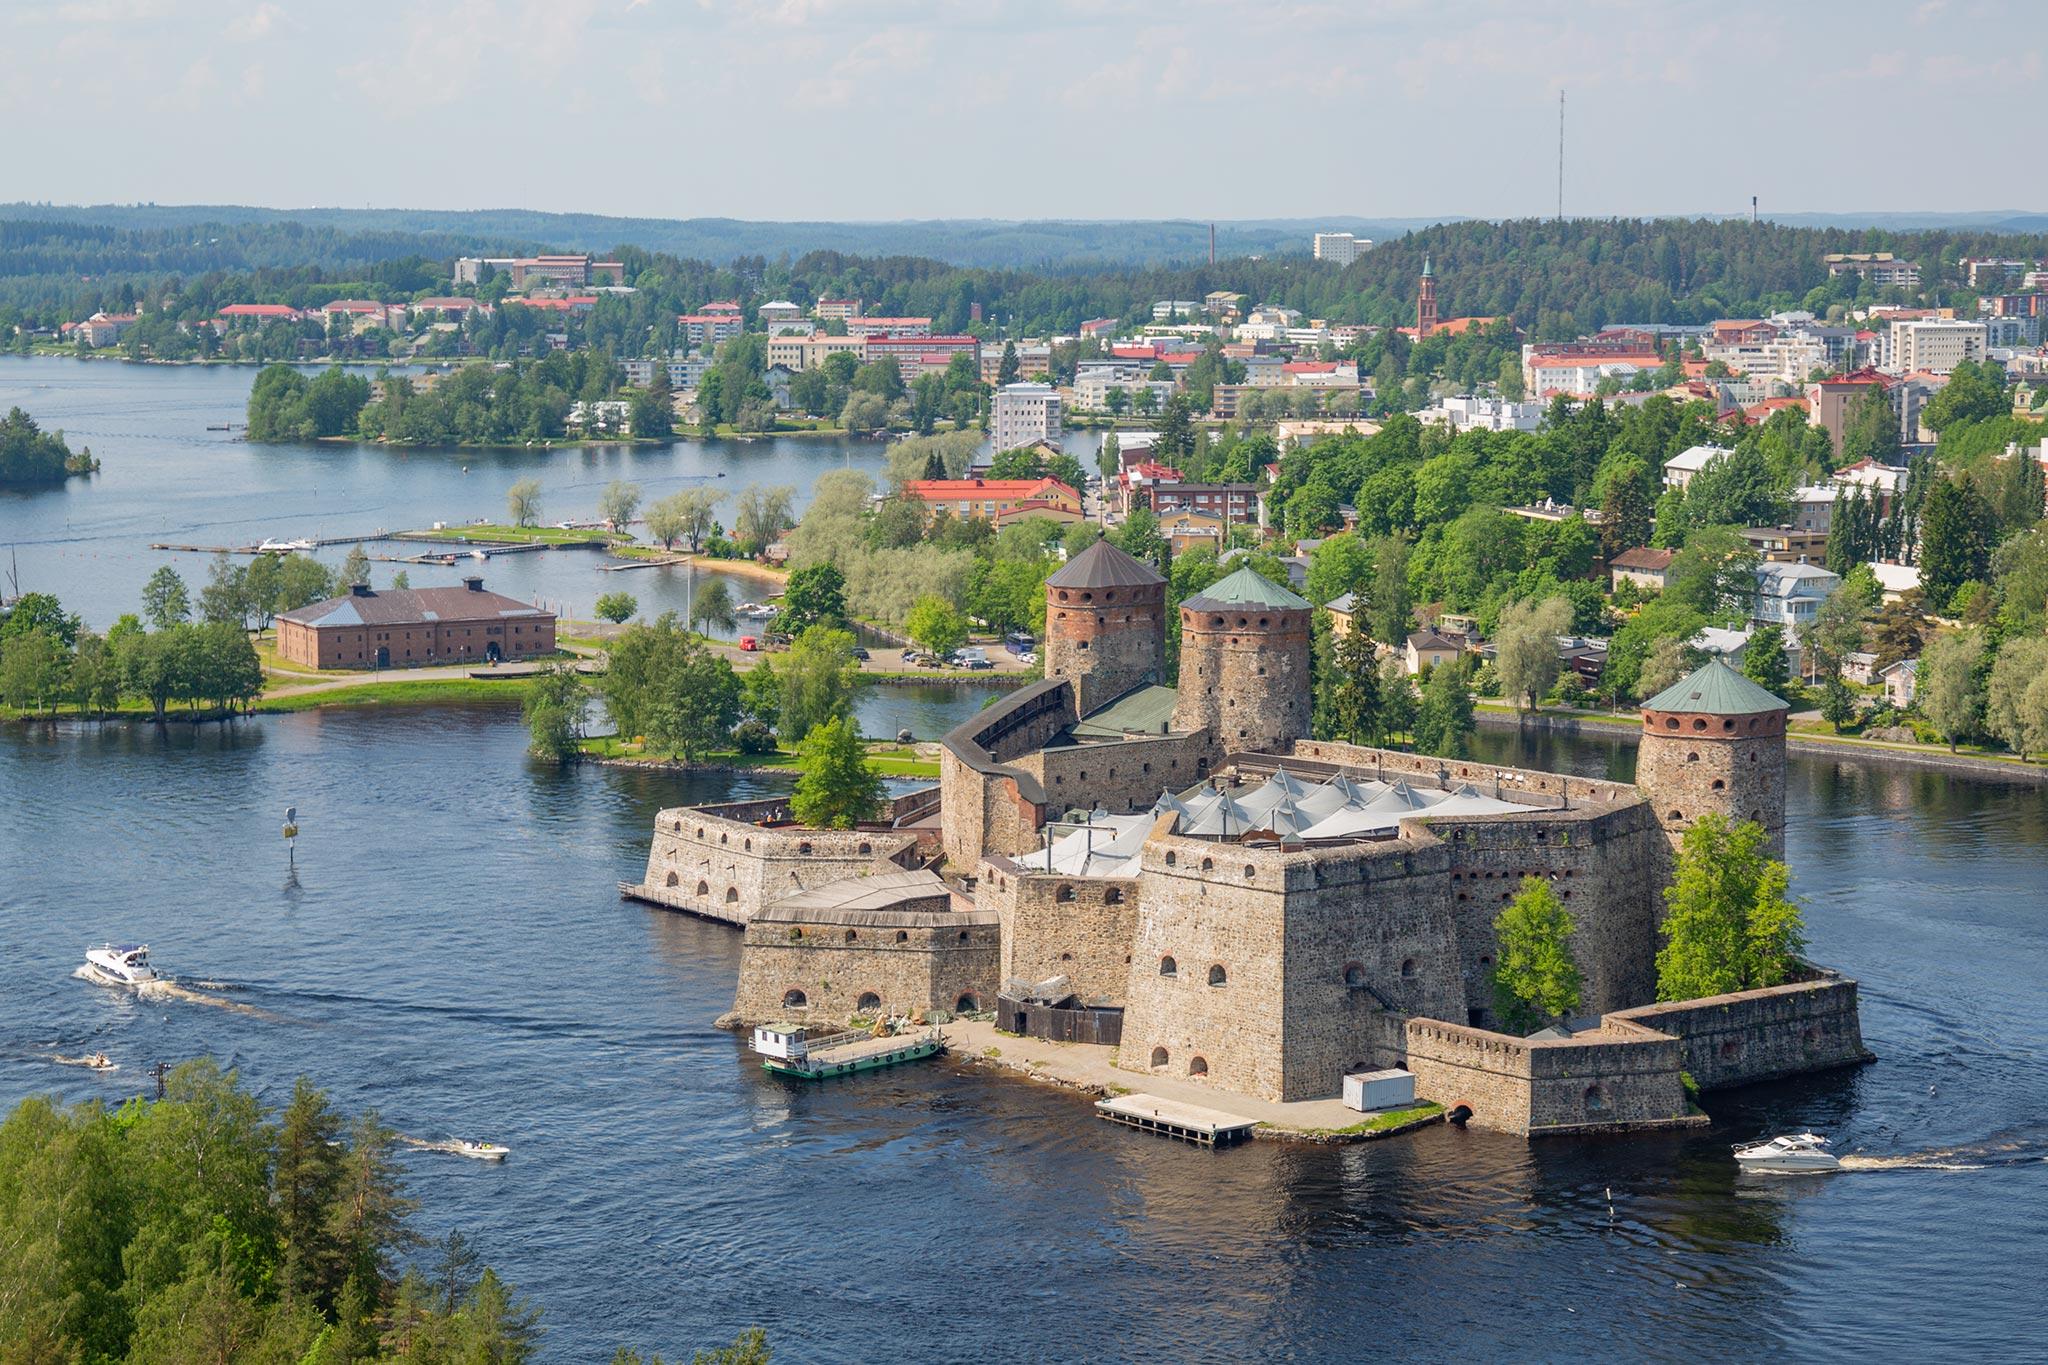 Olavinlinna © Savonlinnan kaupunki